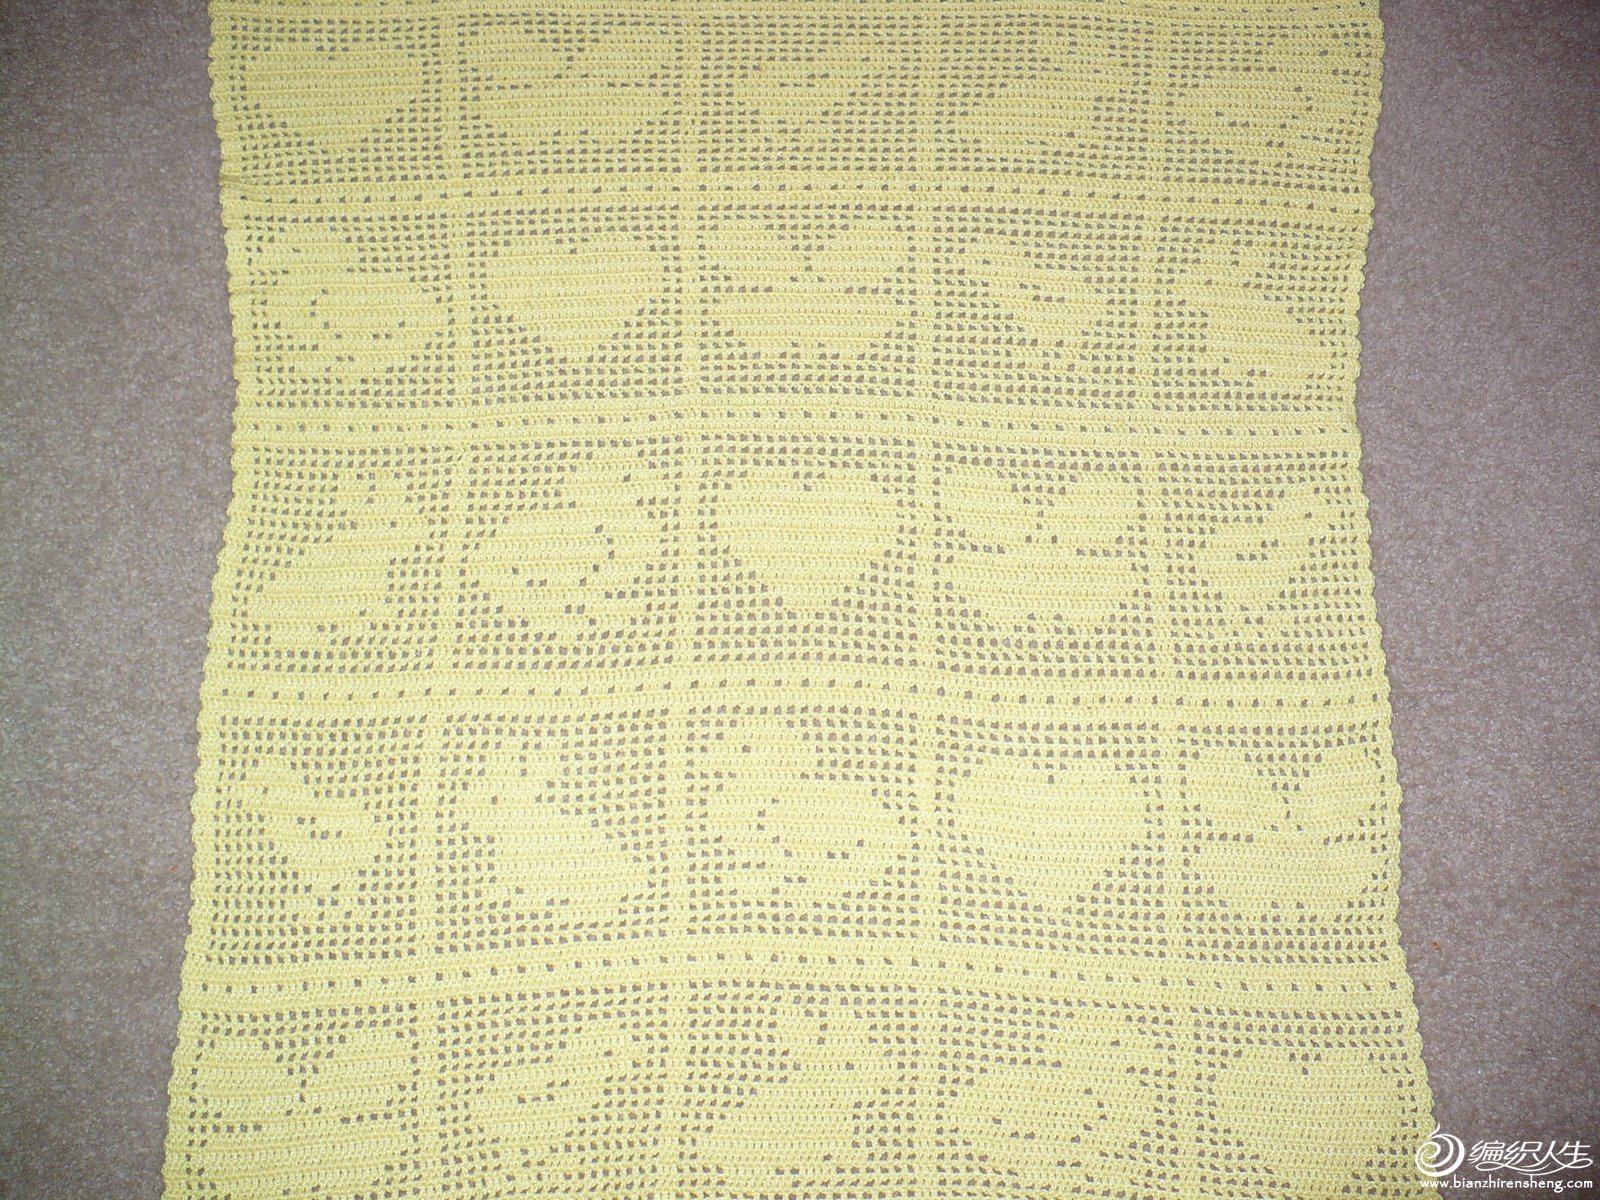 blanket-squares.jpg